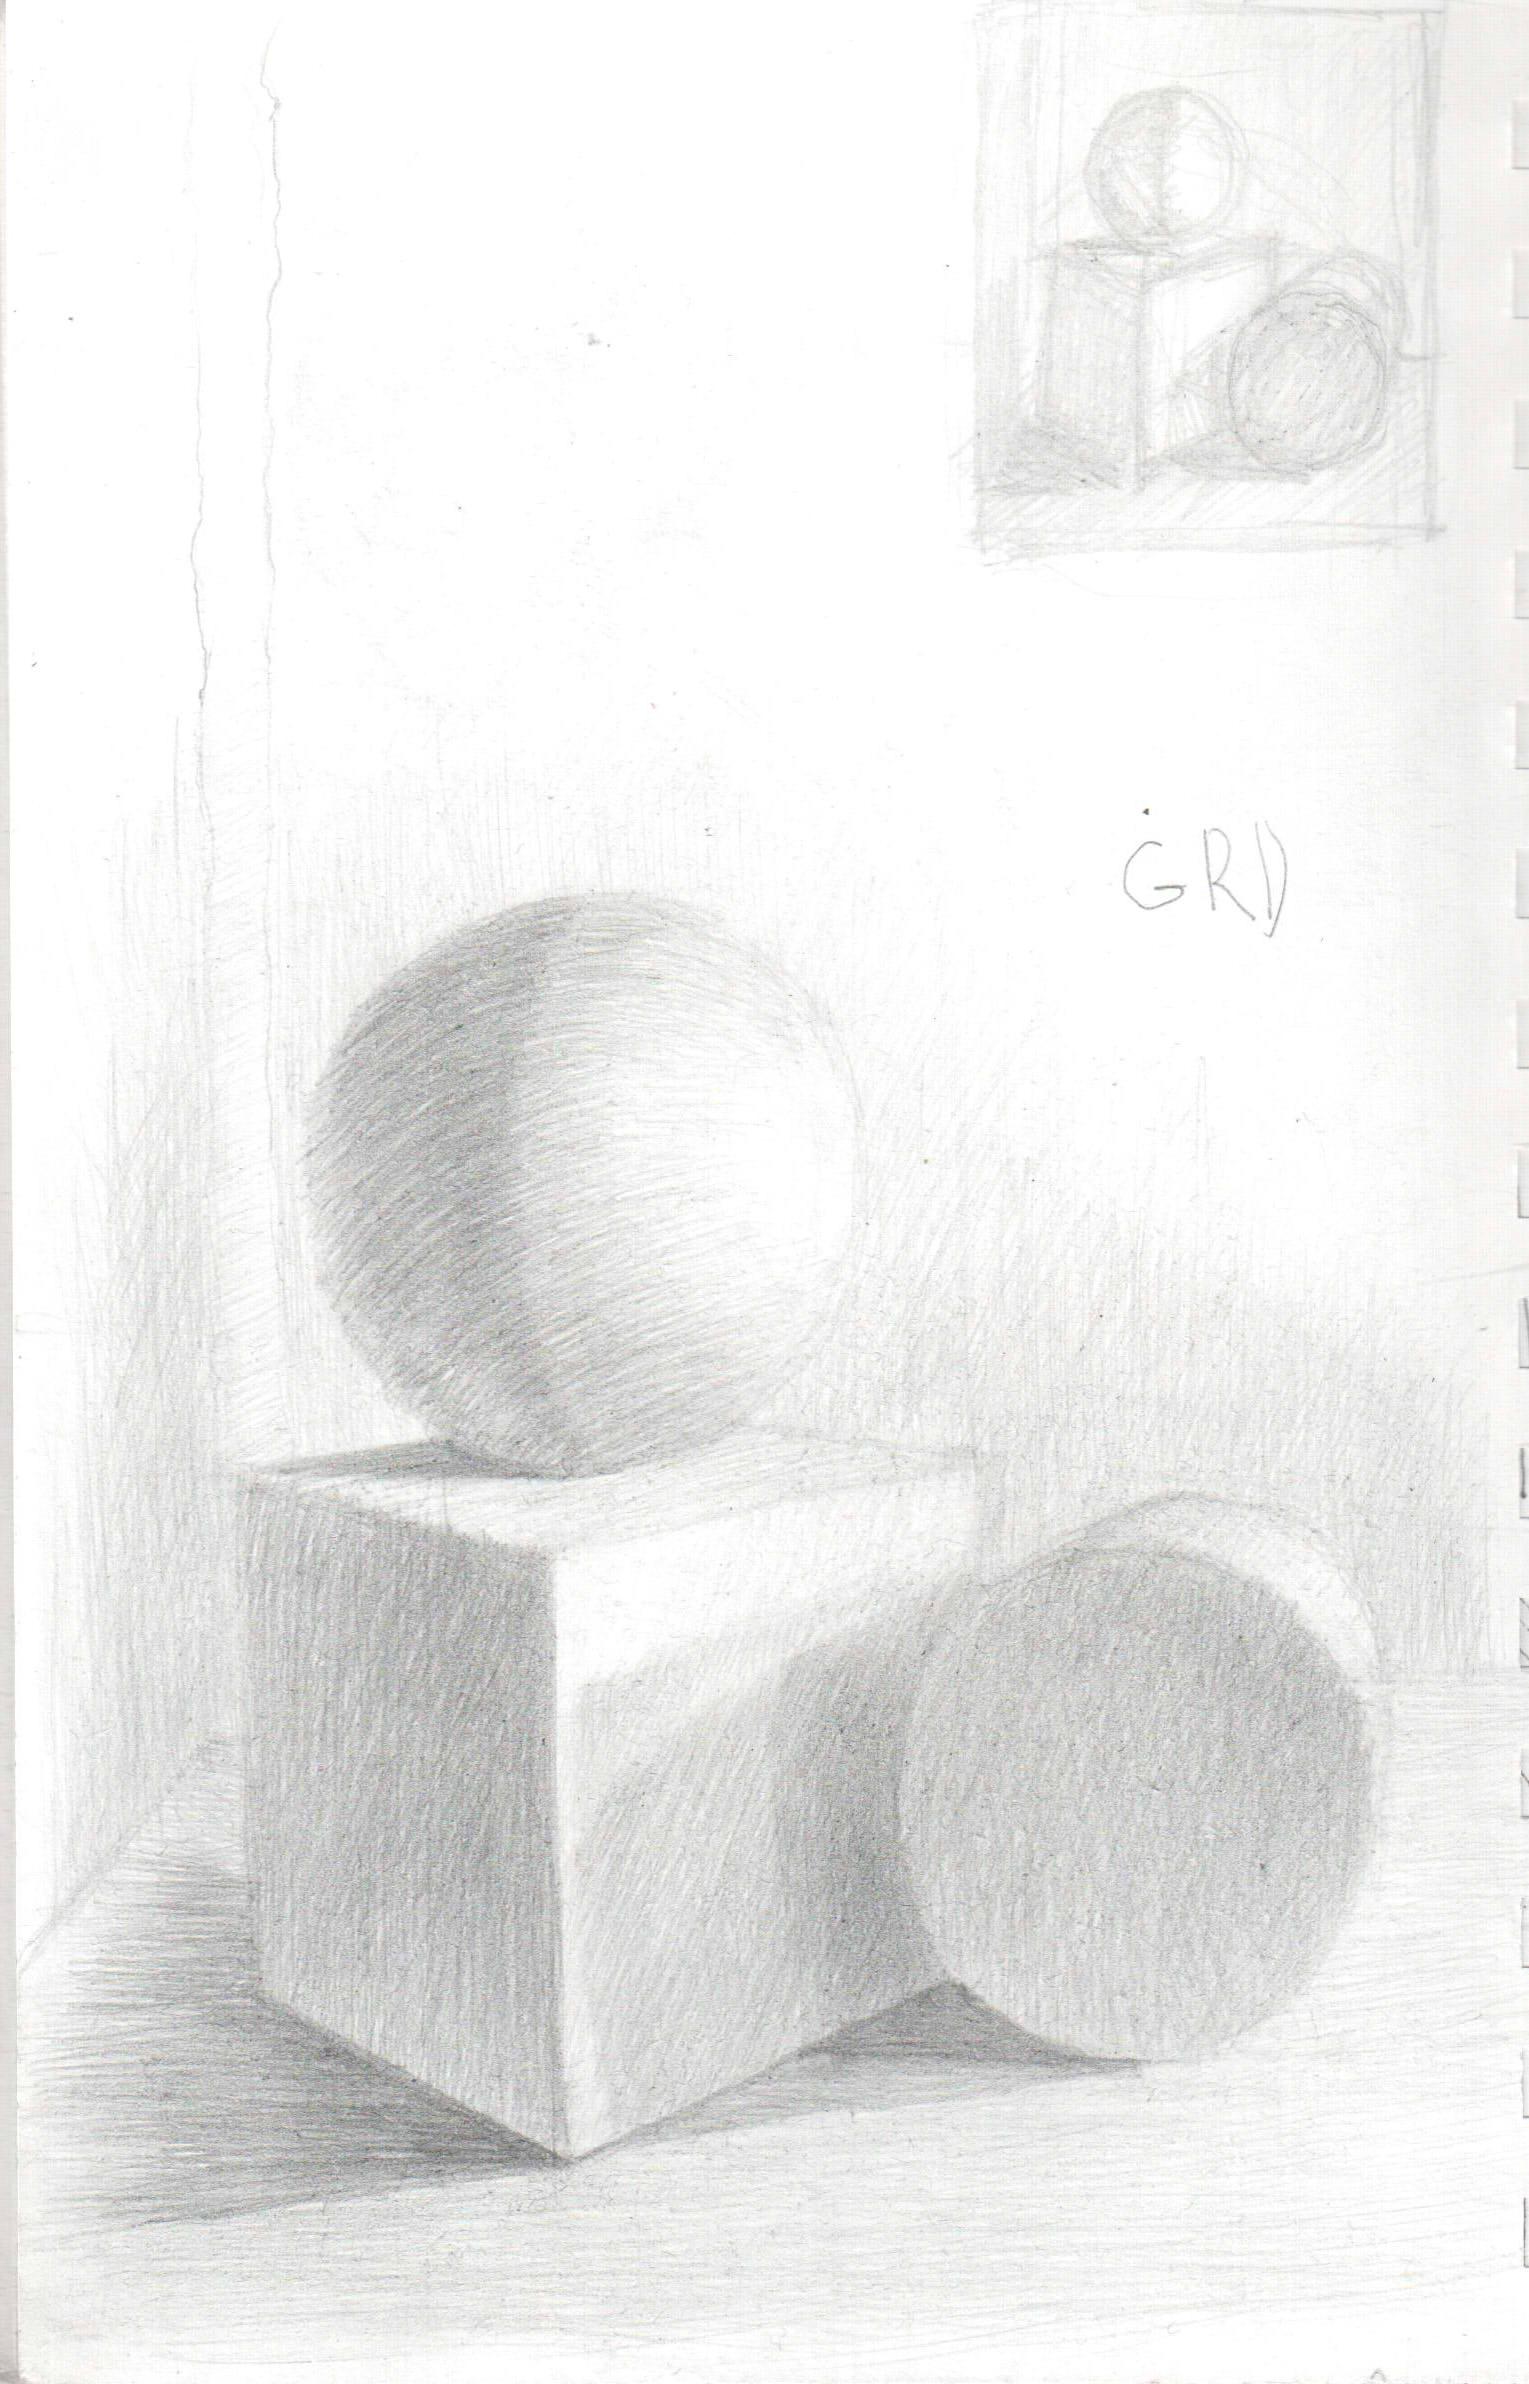 http://s0.uploads.ru/4ltry.jpg